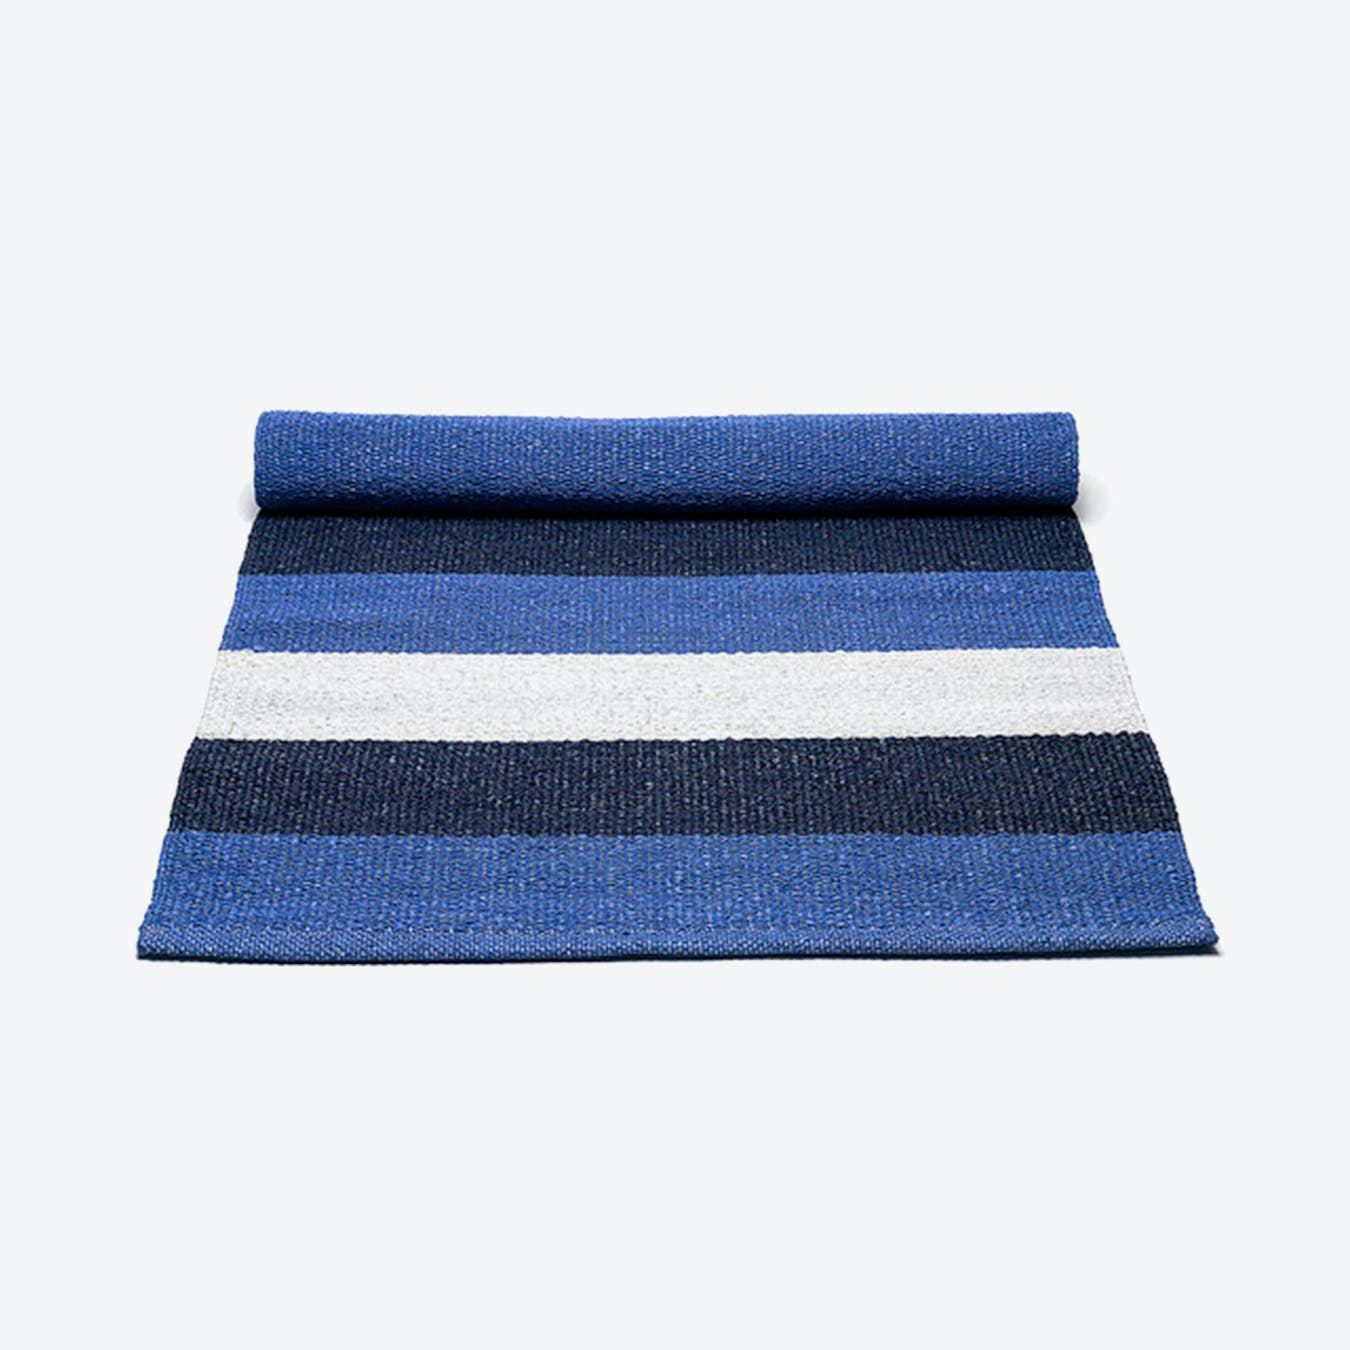 Plastic Rug in Blue White Stripes (200 x 300 cm)